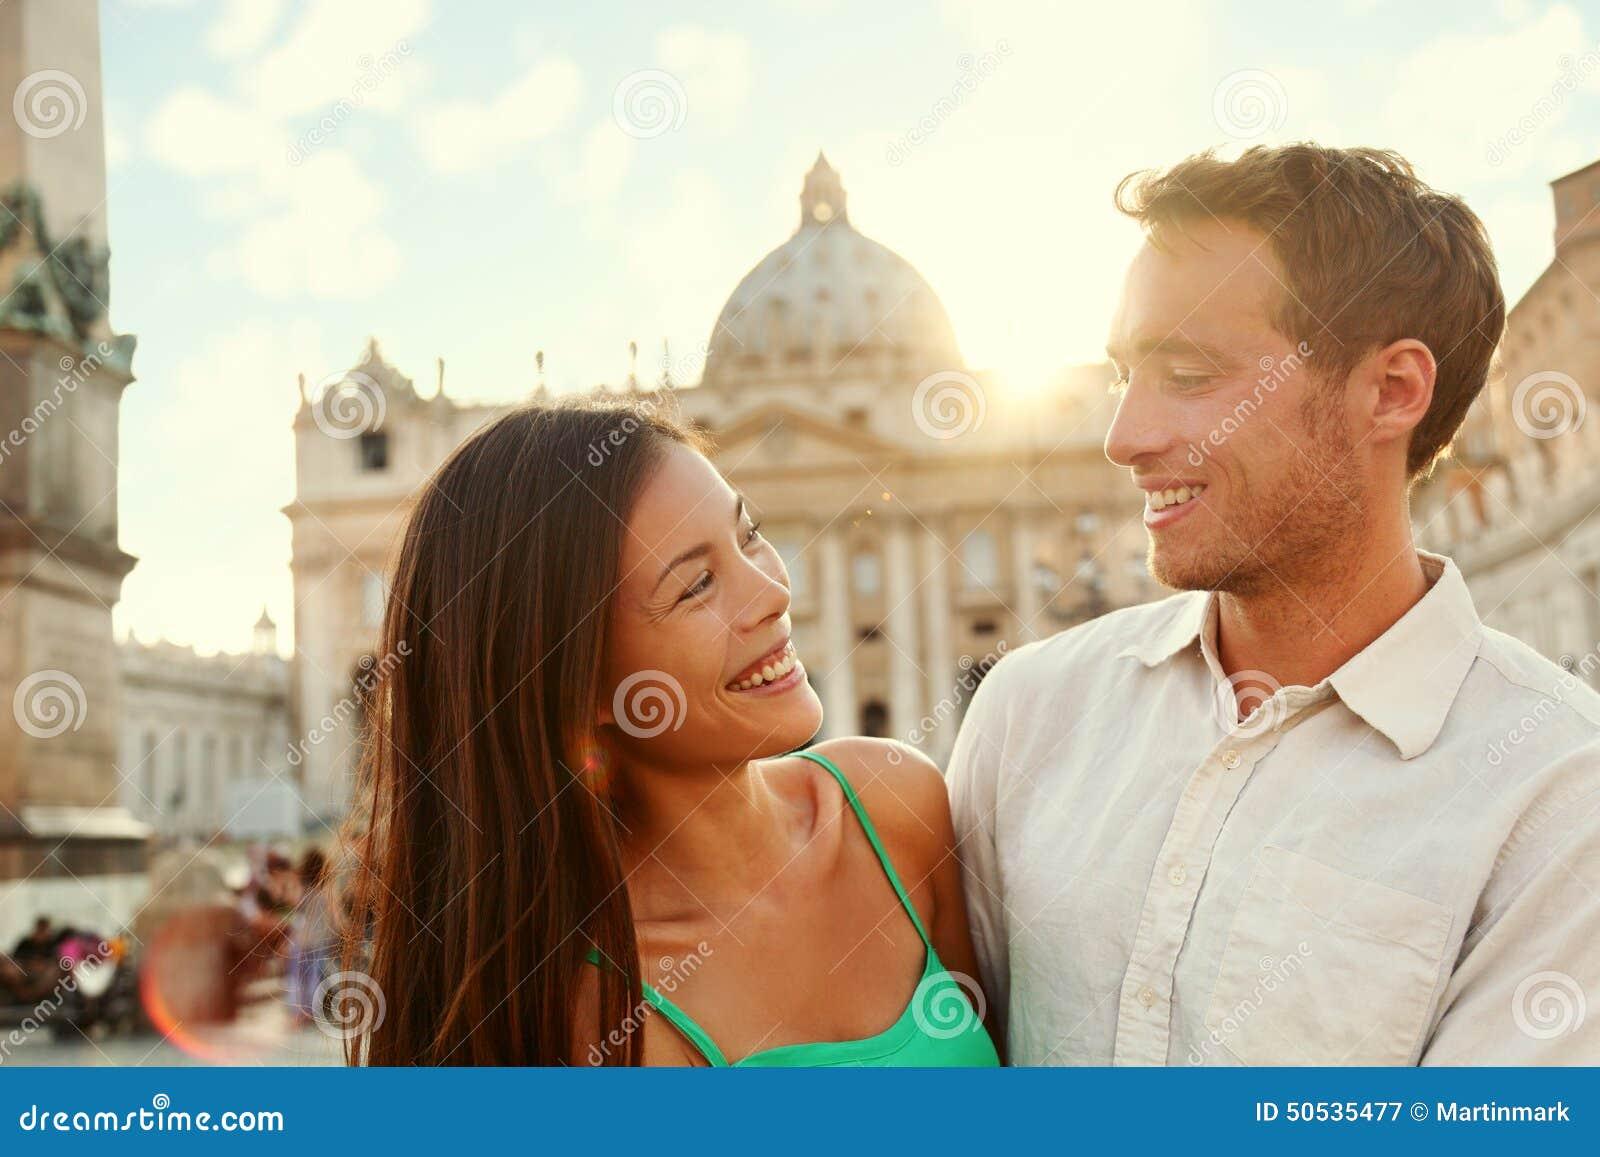 Christian asiatico dating UK